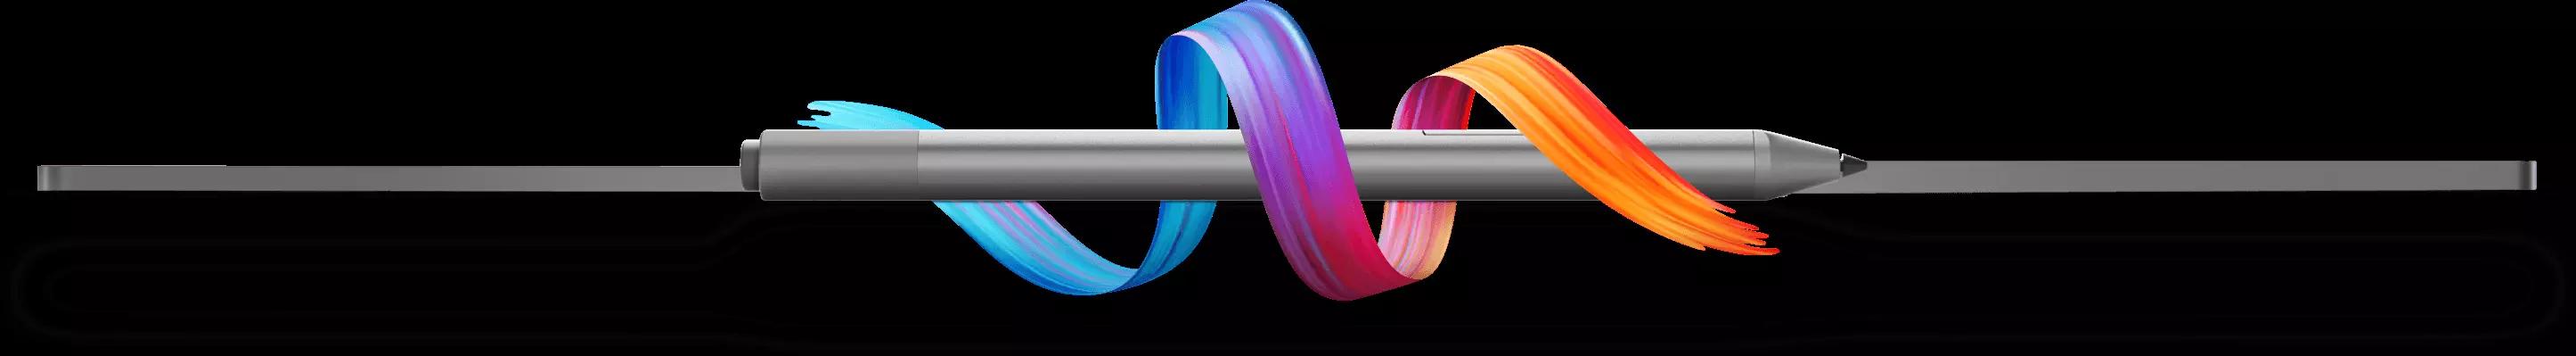 Lenovo Yoga Pen Wrapped in Colorful Ribbon